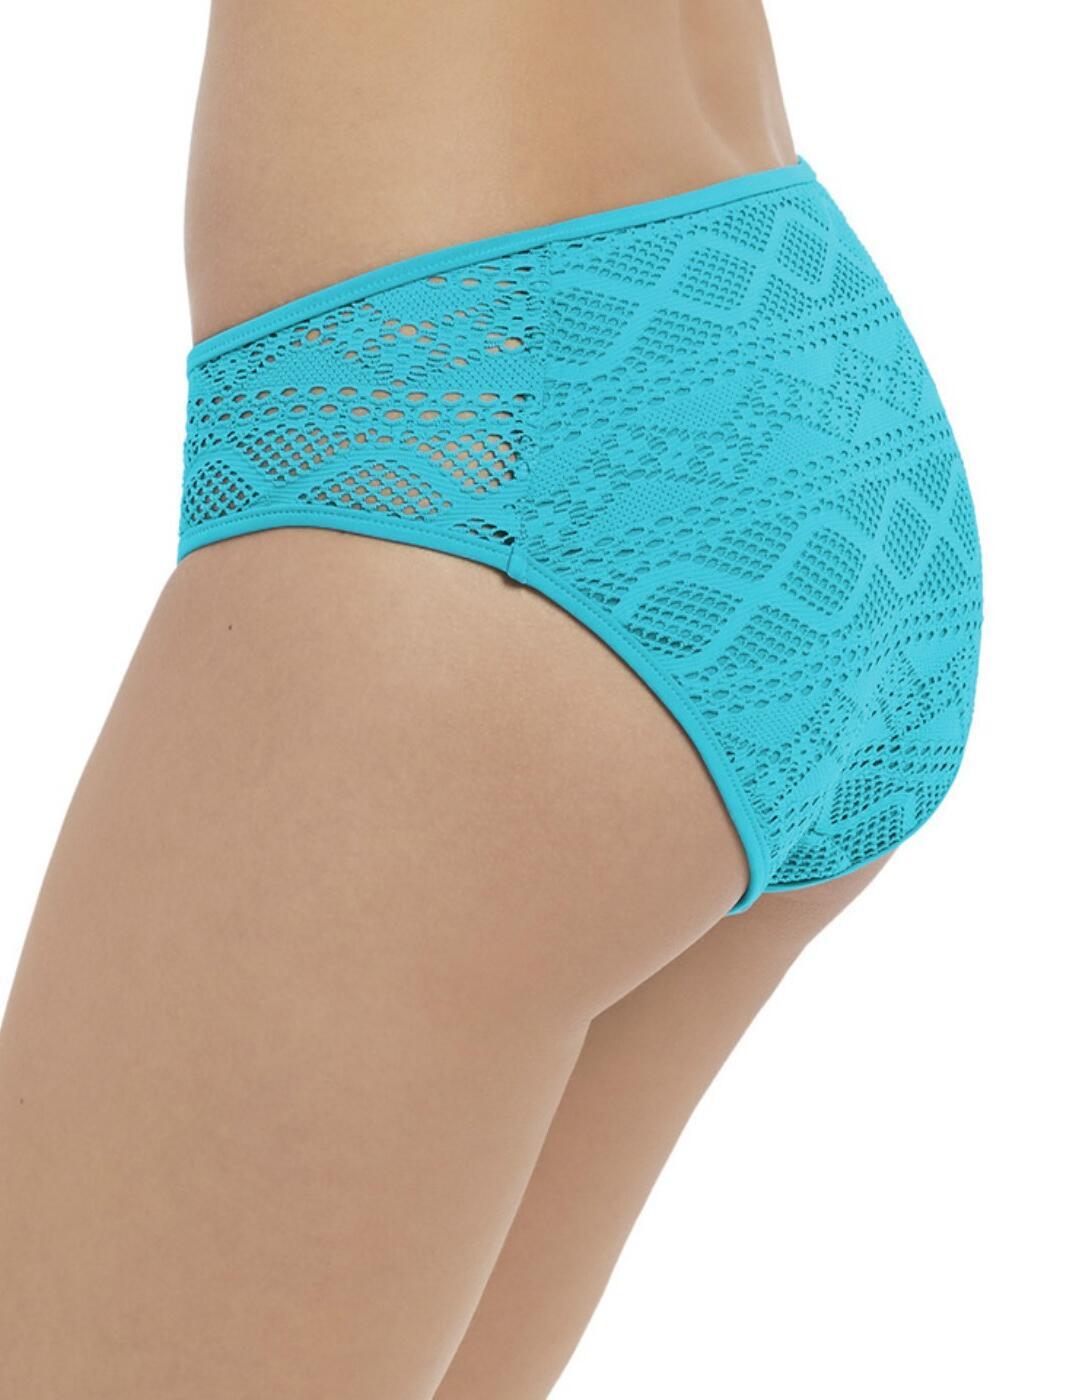 Freya-Sundance-Hipster-Bikini-Brief-Pant-3976-New-Womens-Swimwear thumbnail 4